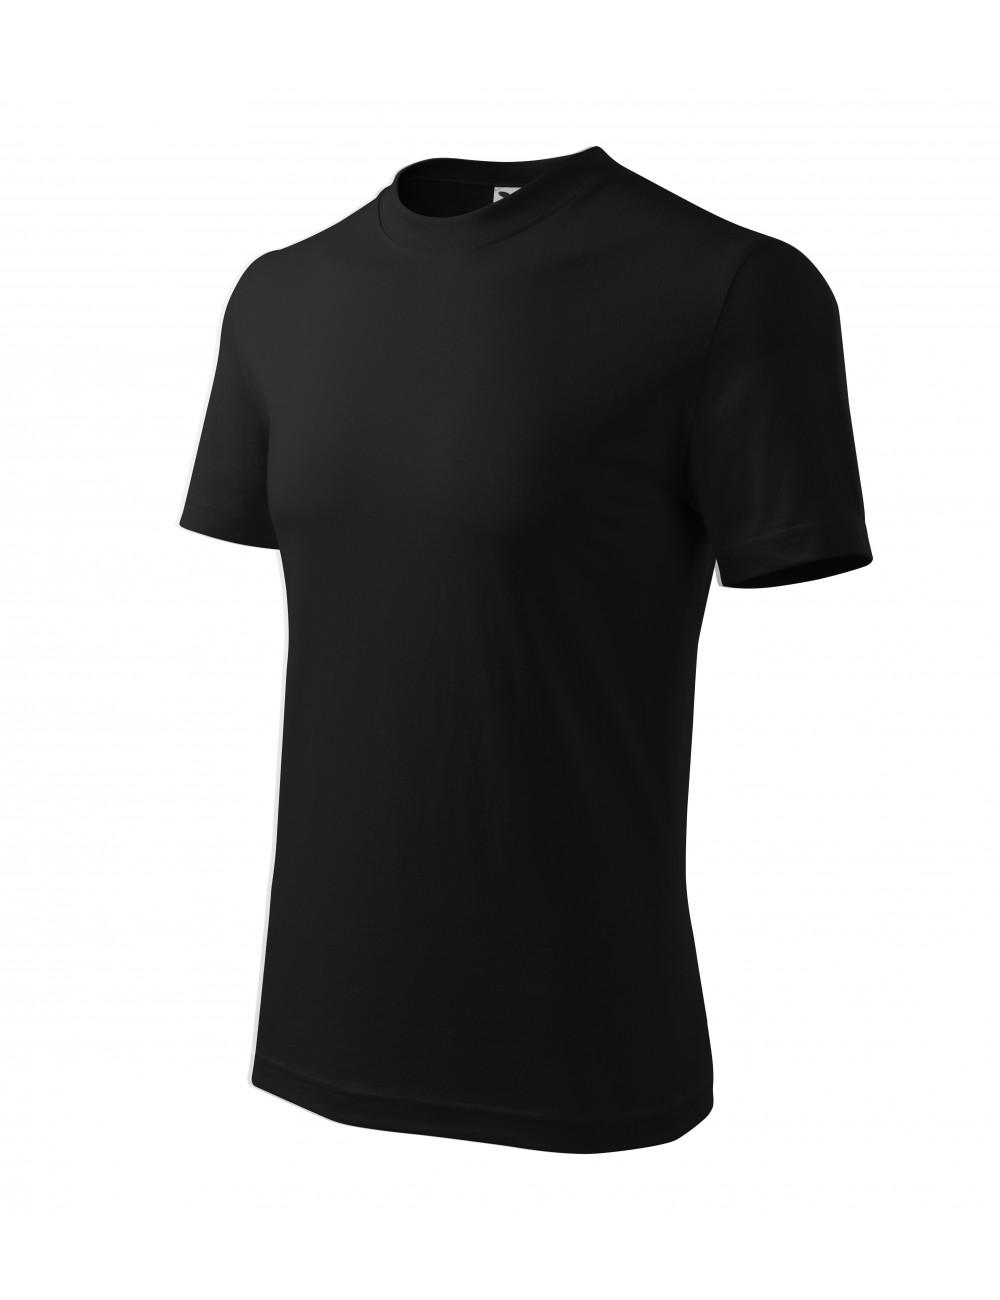 Adler MALFINI Koszulka unisex Classic 101 czarny